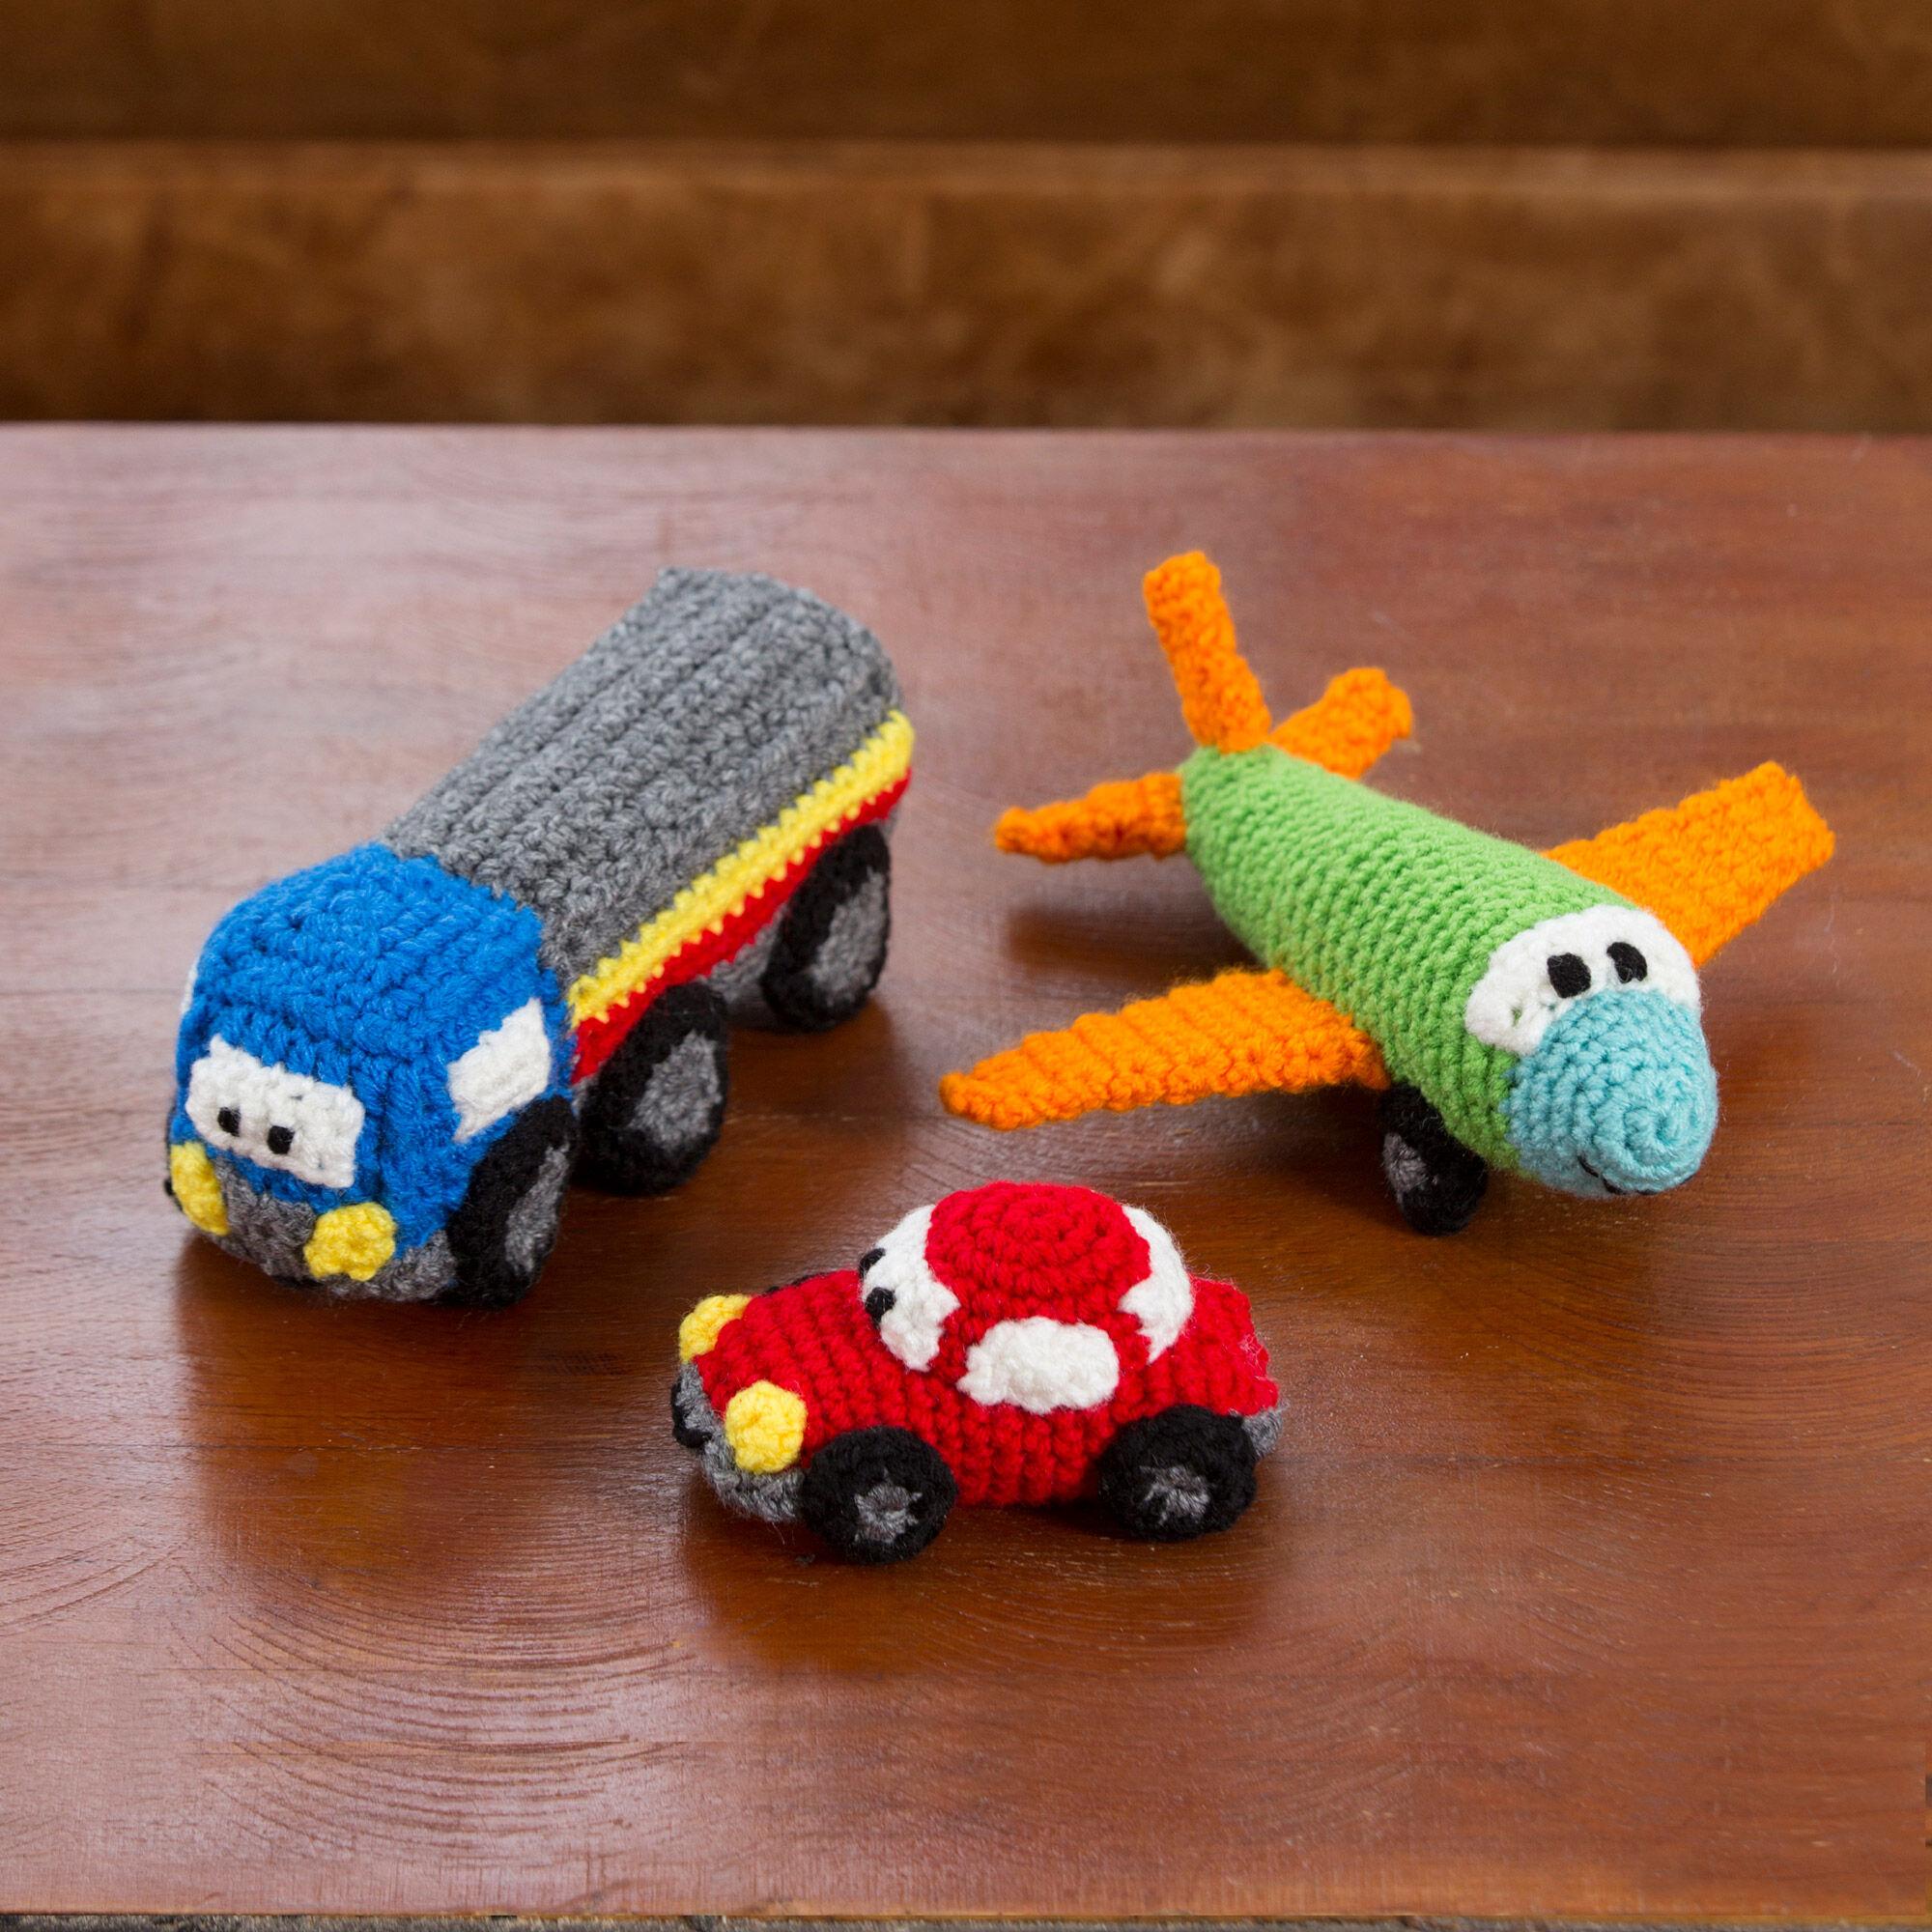 Red Heart's Best: 12 Free Baby Crochet Patterns | AllFreeCrochet.com | 2000x2000